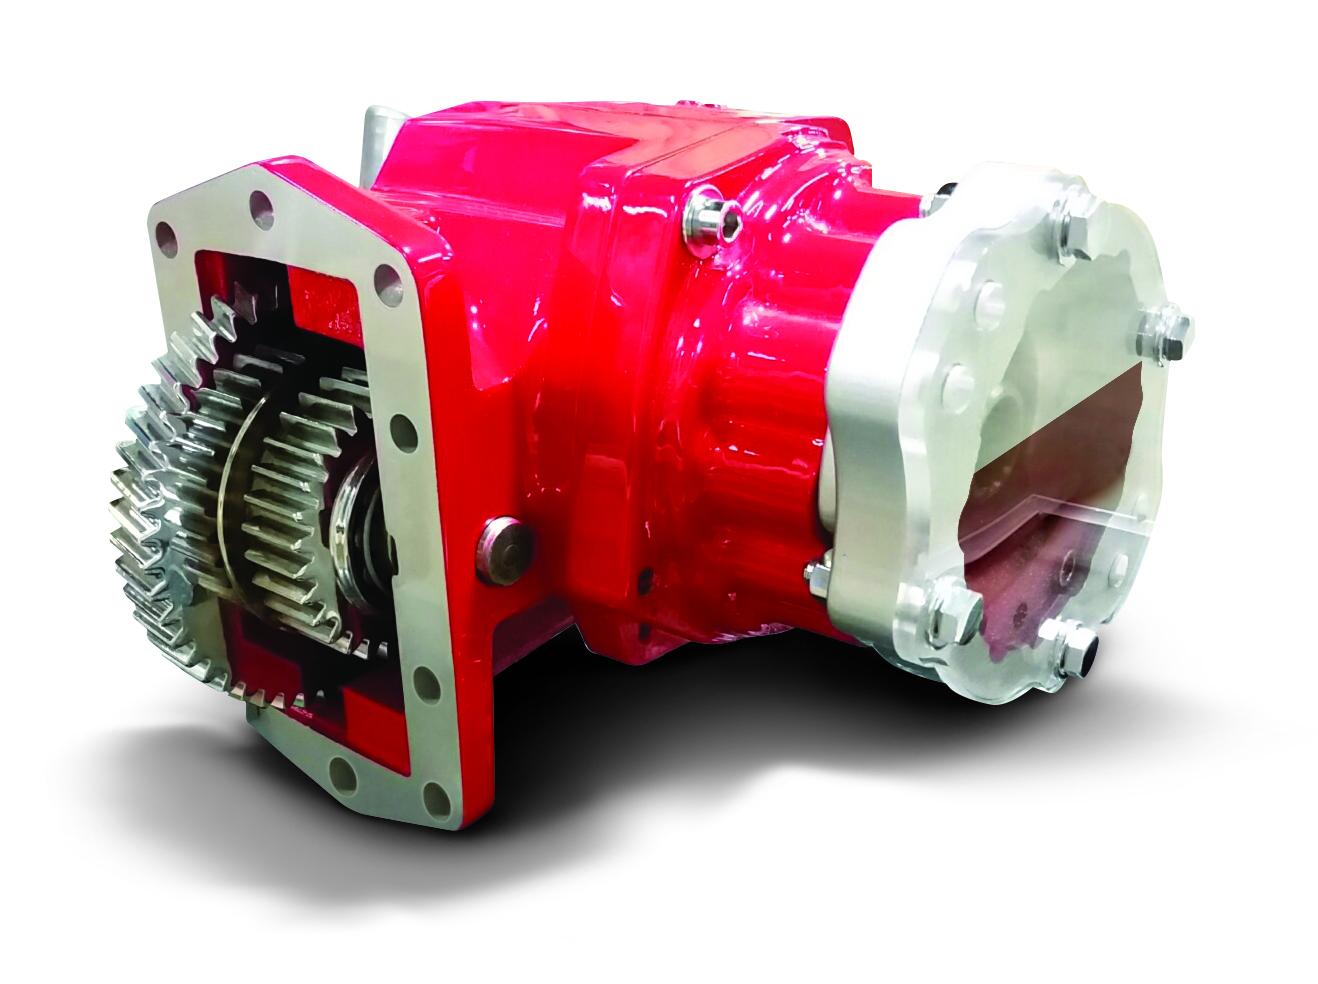 Parker Wet Spline Technology Eliminates Fretting Corrosion on PTO pump shaft